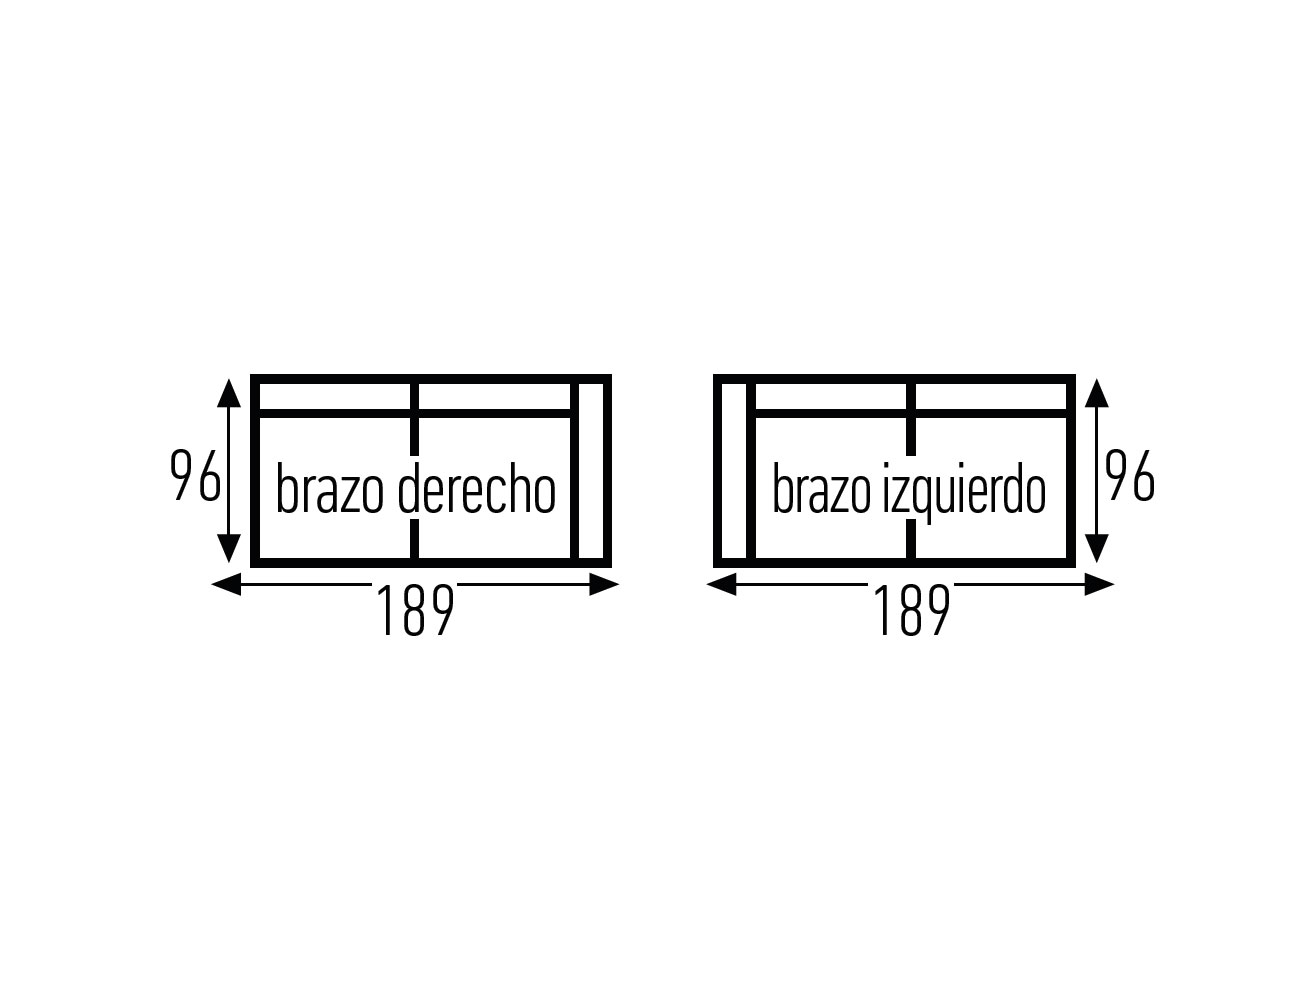 Croquis 3p sin 1 brazo 1891